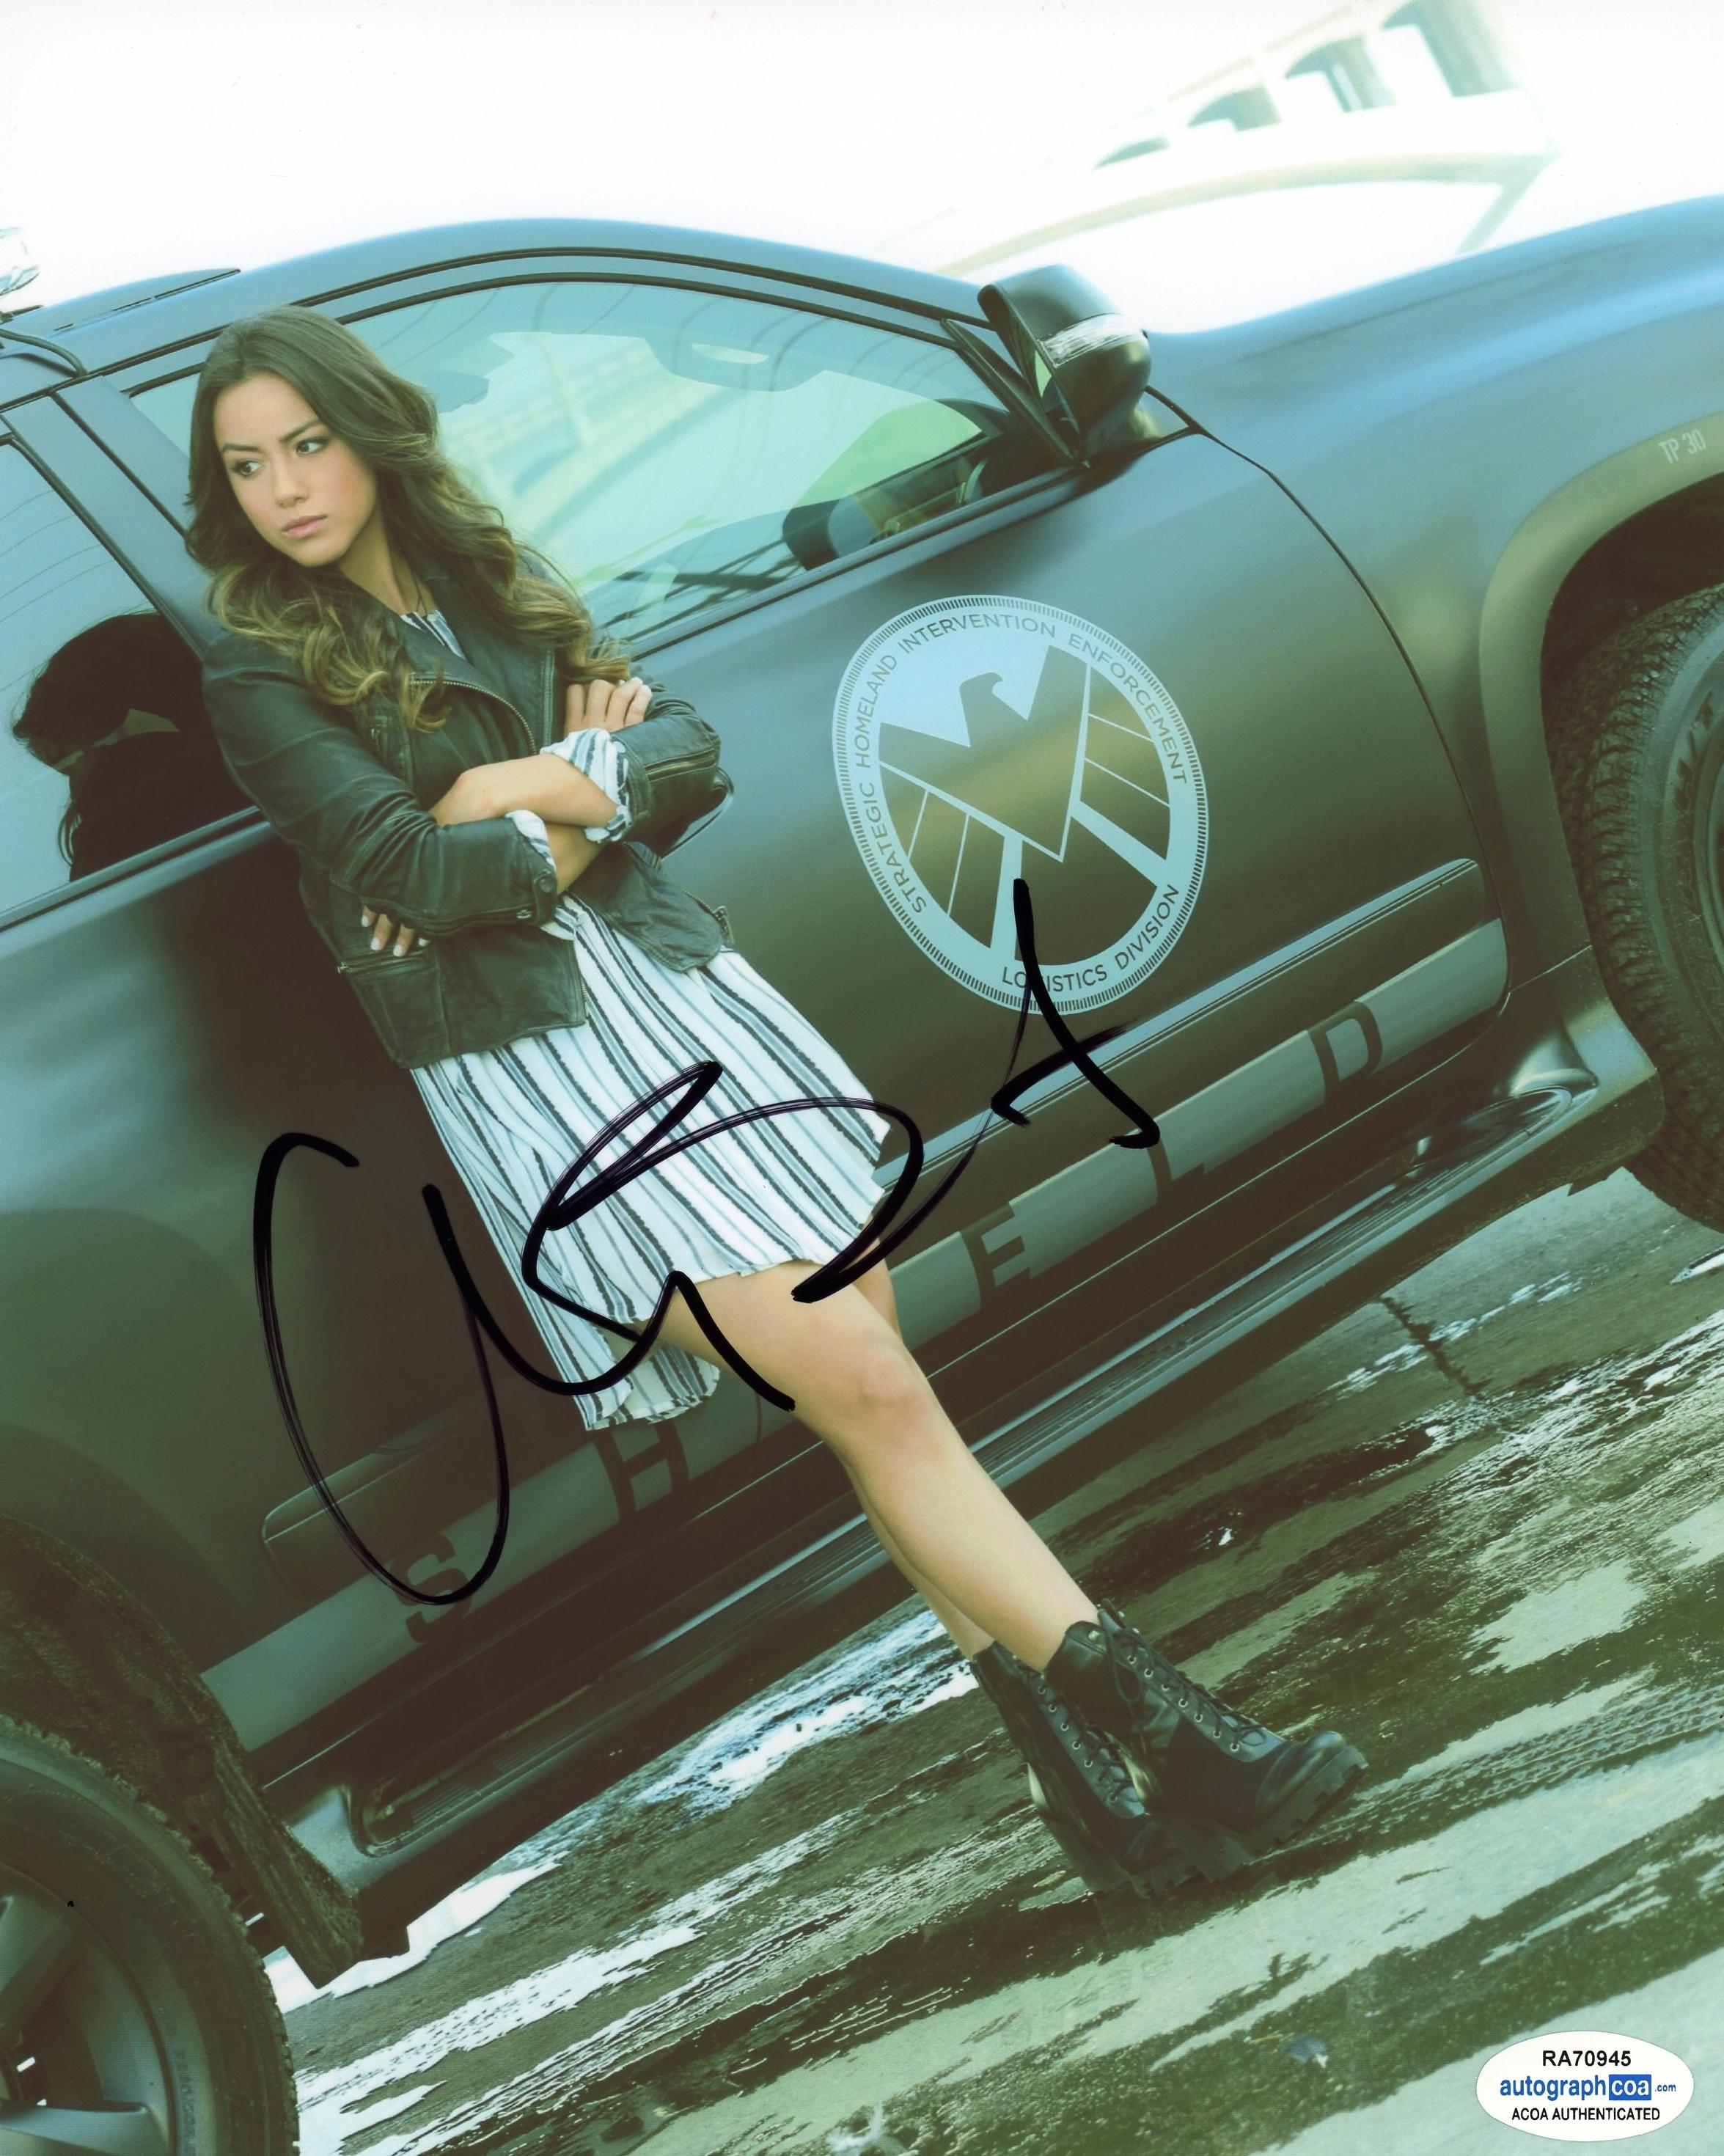 Chloe-Bennet-034-Agents-of-SHIELD-034-AUTOGRAPH-Signed-8x10-Photo-ACOA thumbnail 2